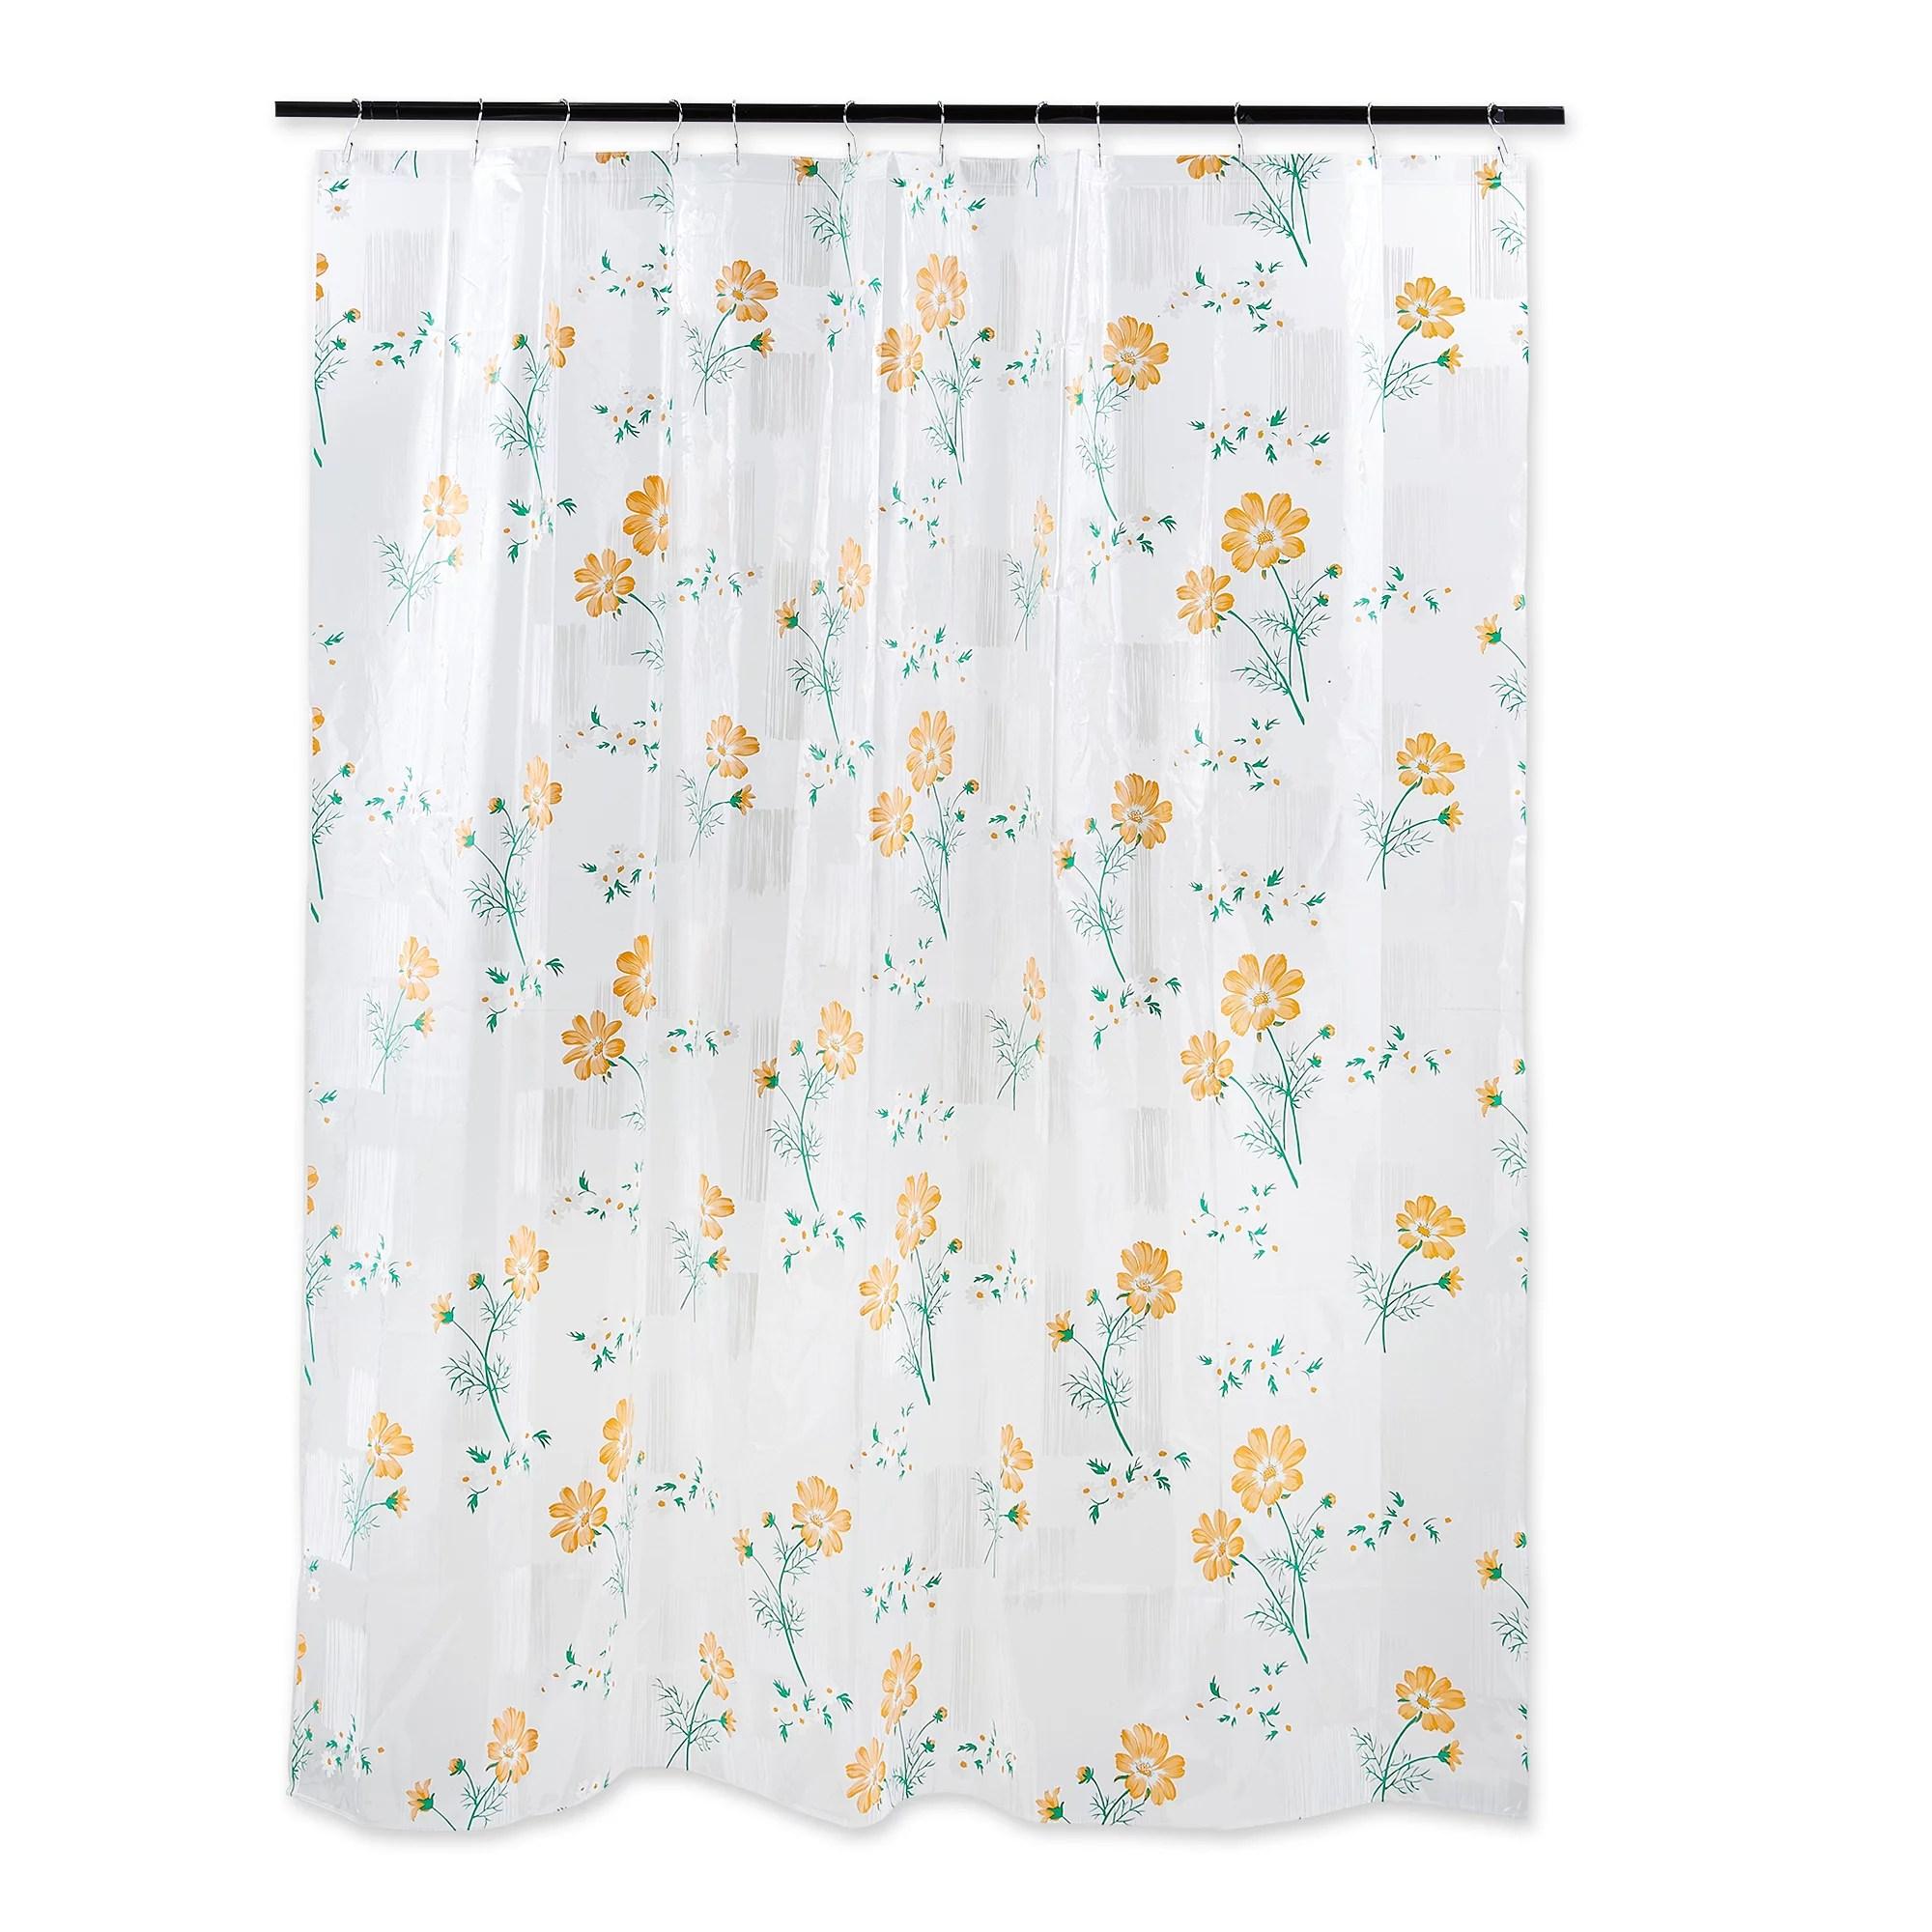 6 orange and green floral print home and bathroom essentials shower curtain walmart com